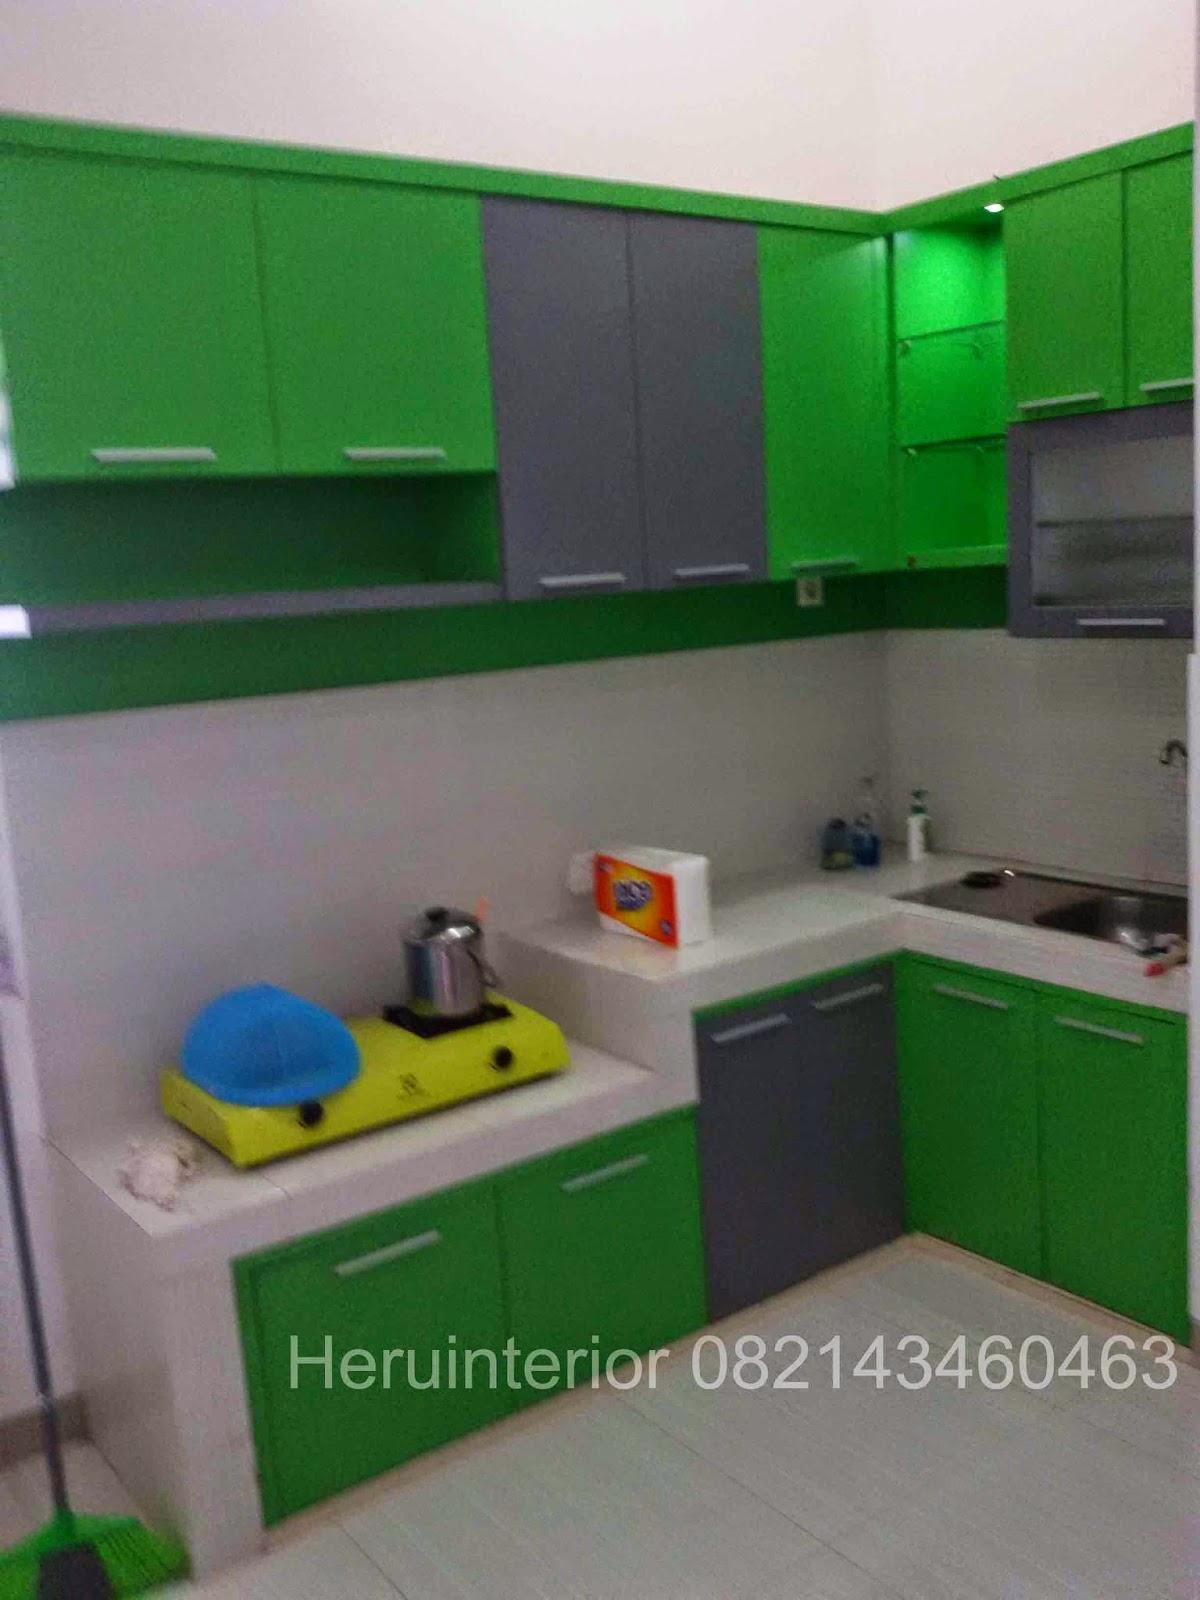 Kontraktor interior surabaya sidoarjo desain kitchen set for Kitchen set bawah